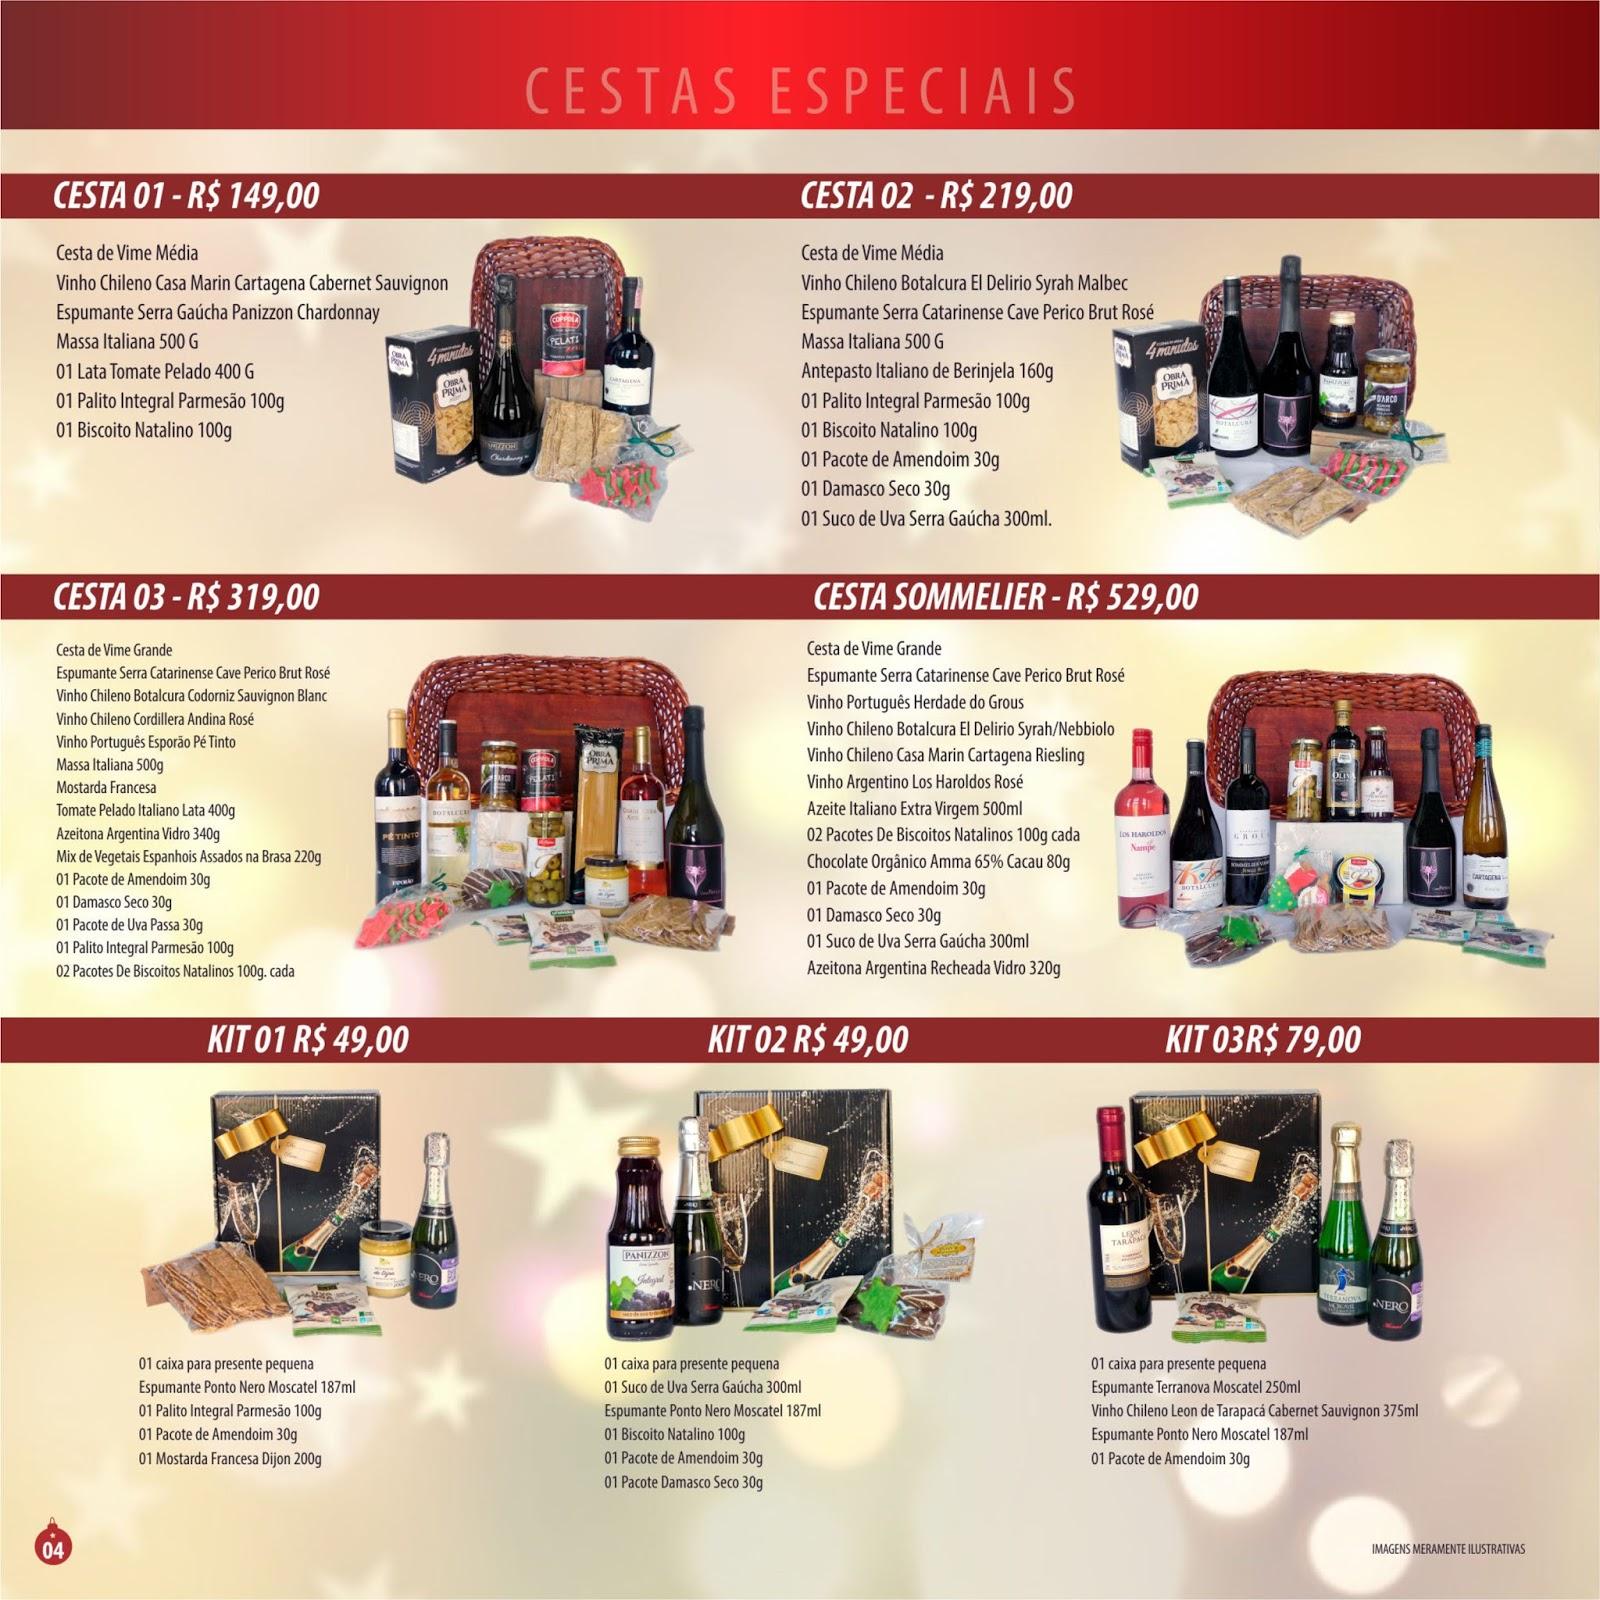 Sommelier vinhos passo da p tria 166 cat logo natal 2017 for Catalogo bp 2017